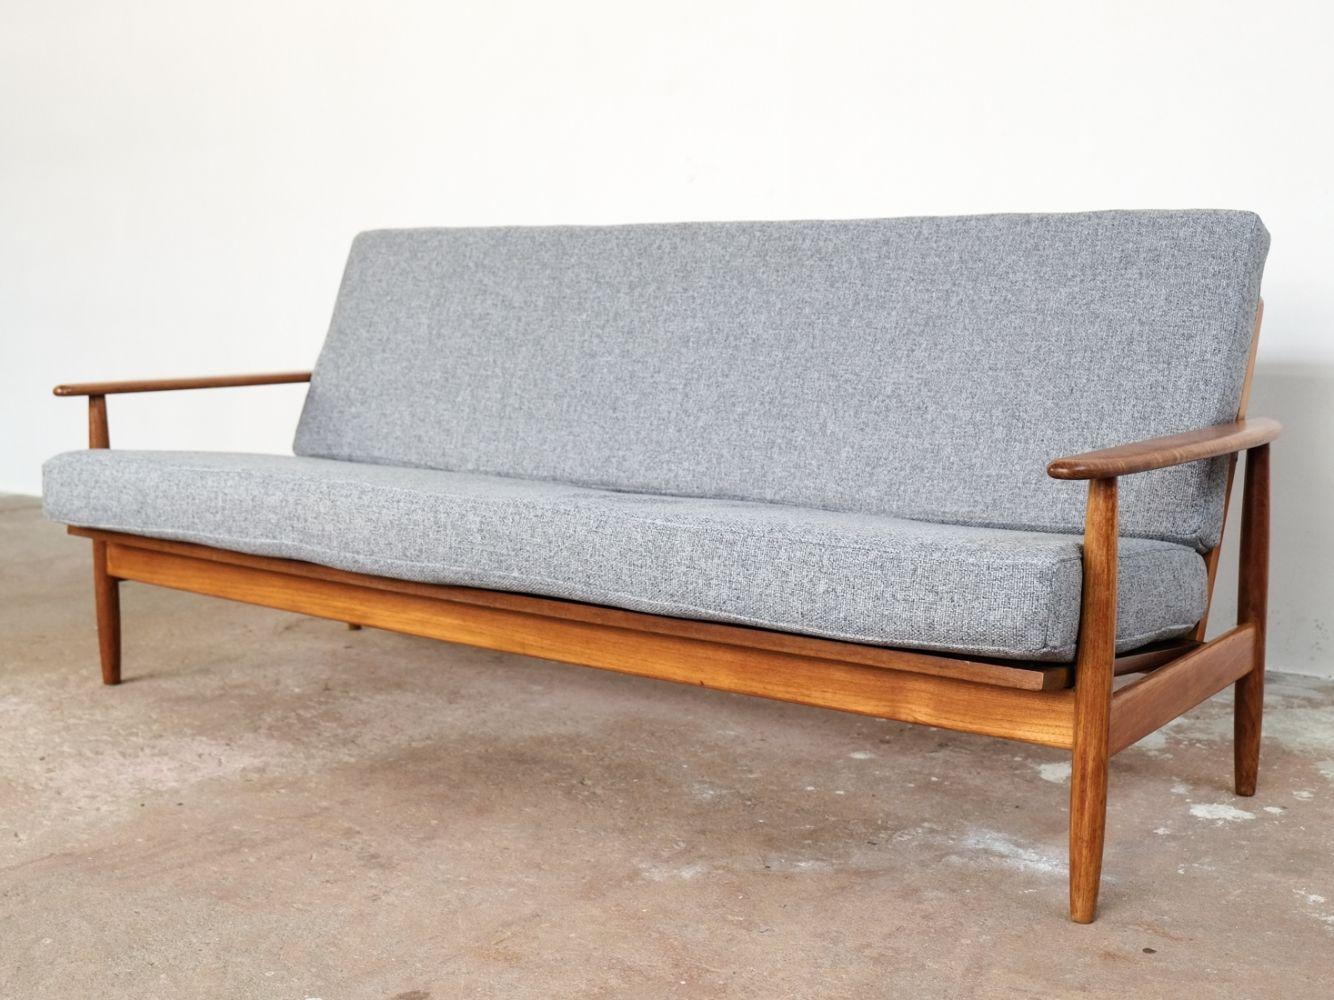 Danish Sofa In Teak With New Cushions In Fabric 1960s Danish Sofa Retro Sofa Vintage Sofa